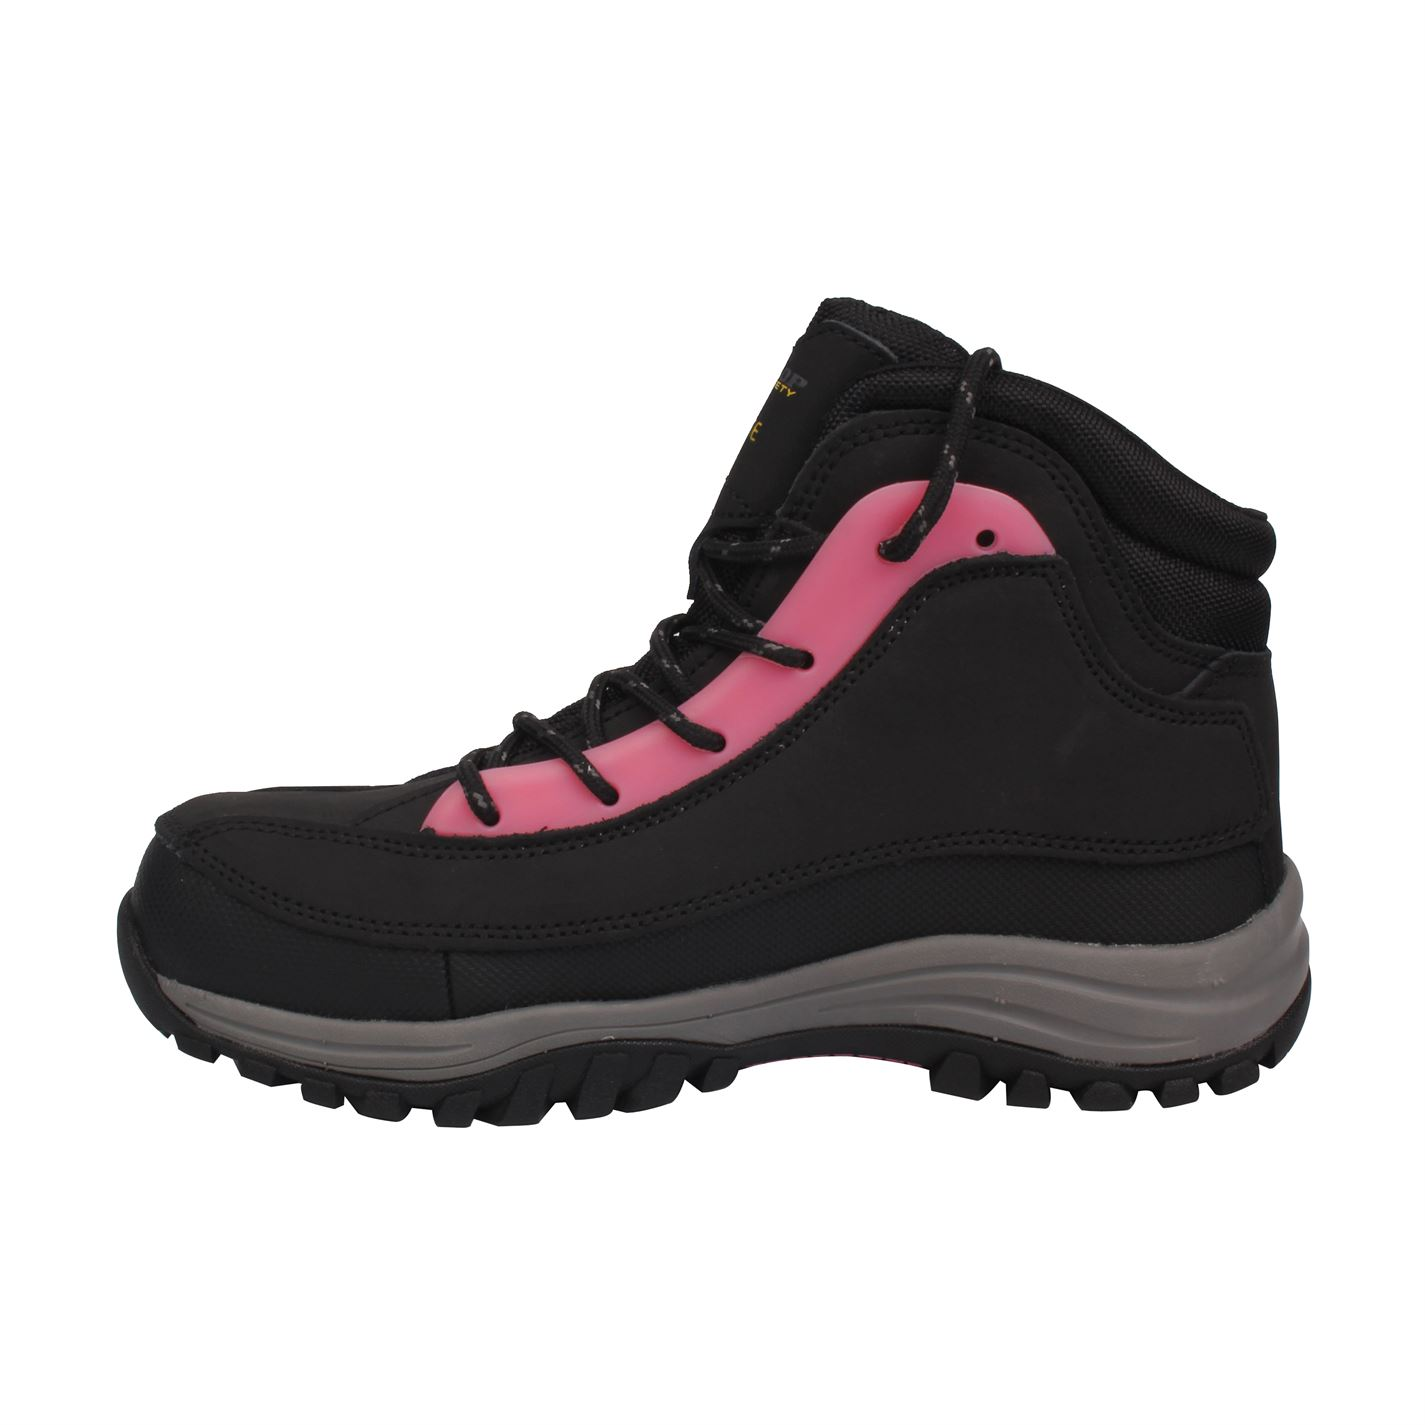 Dunlop Kids Minnesota SB Safety Boots